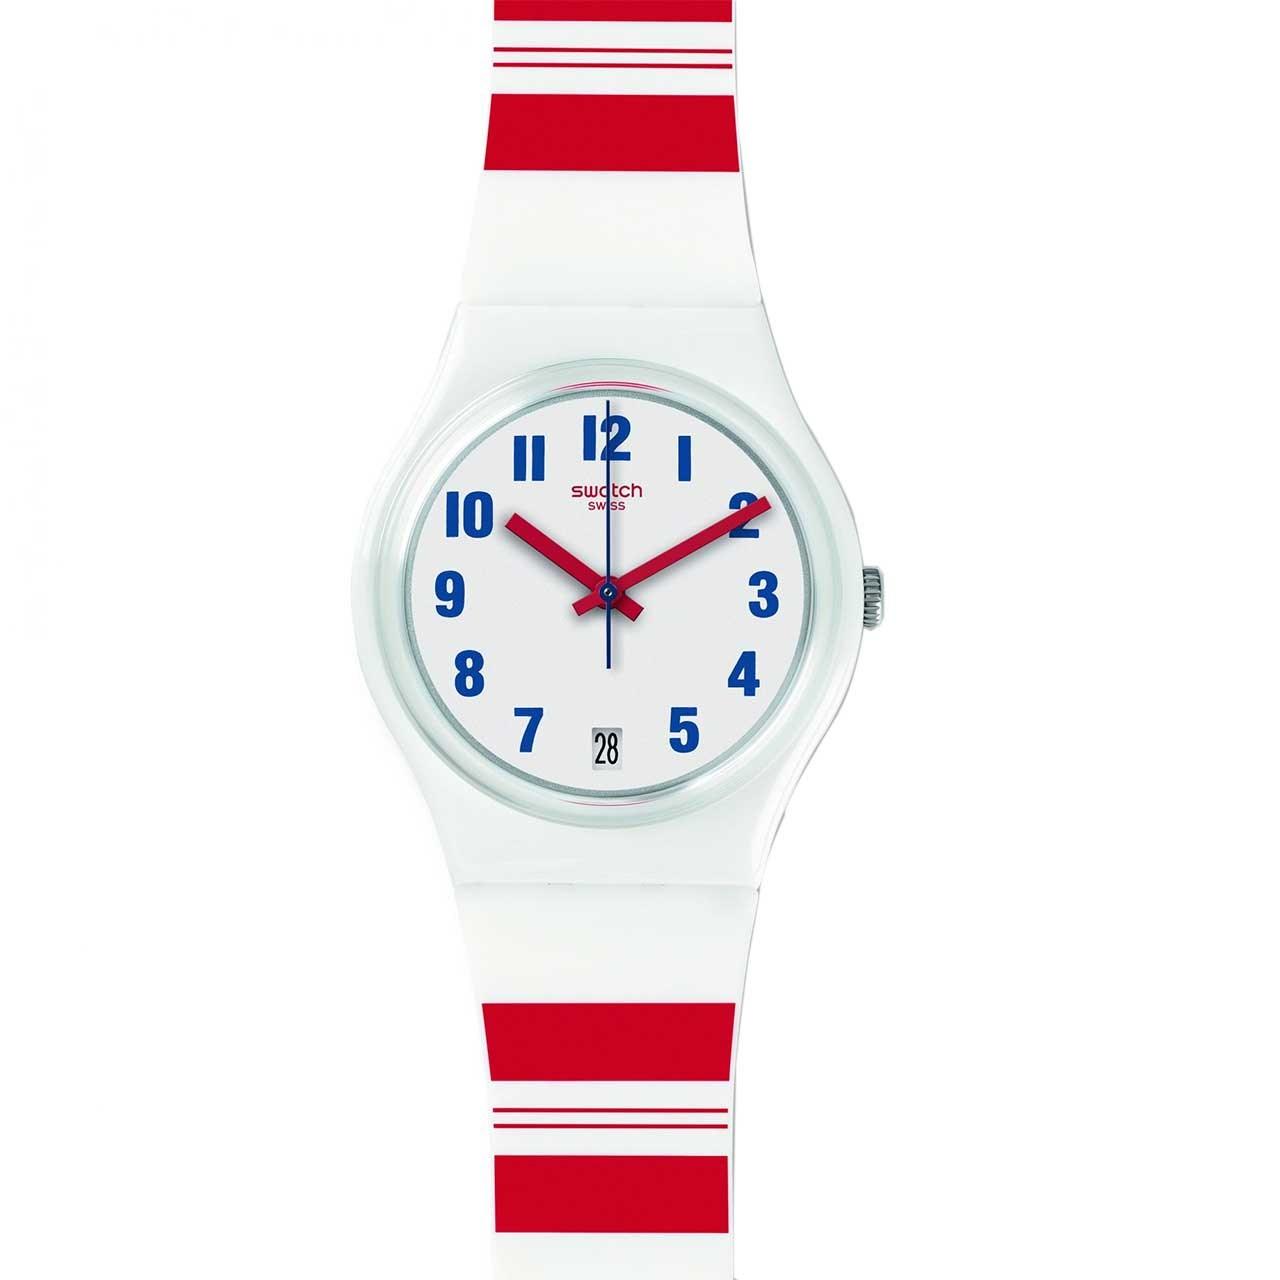 ساعت زنانه برند سواچ مدل GW407